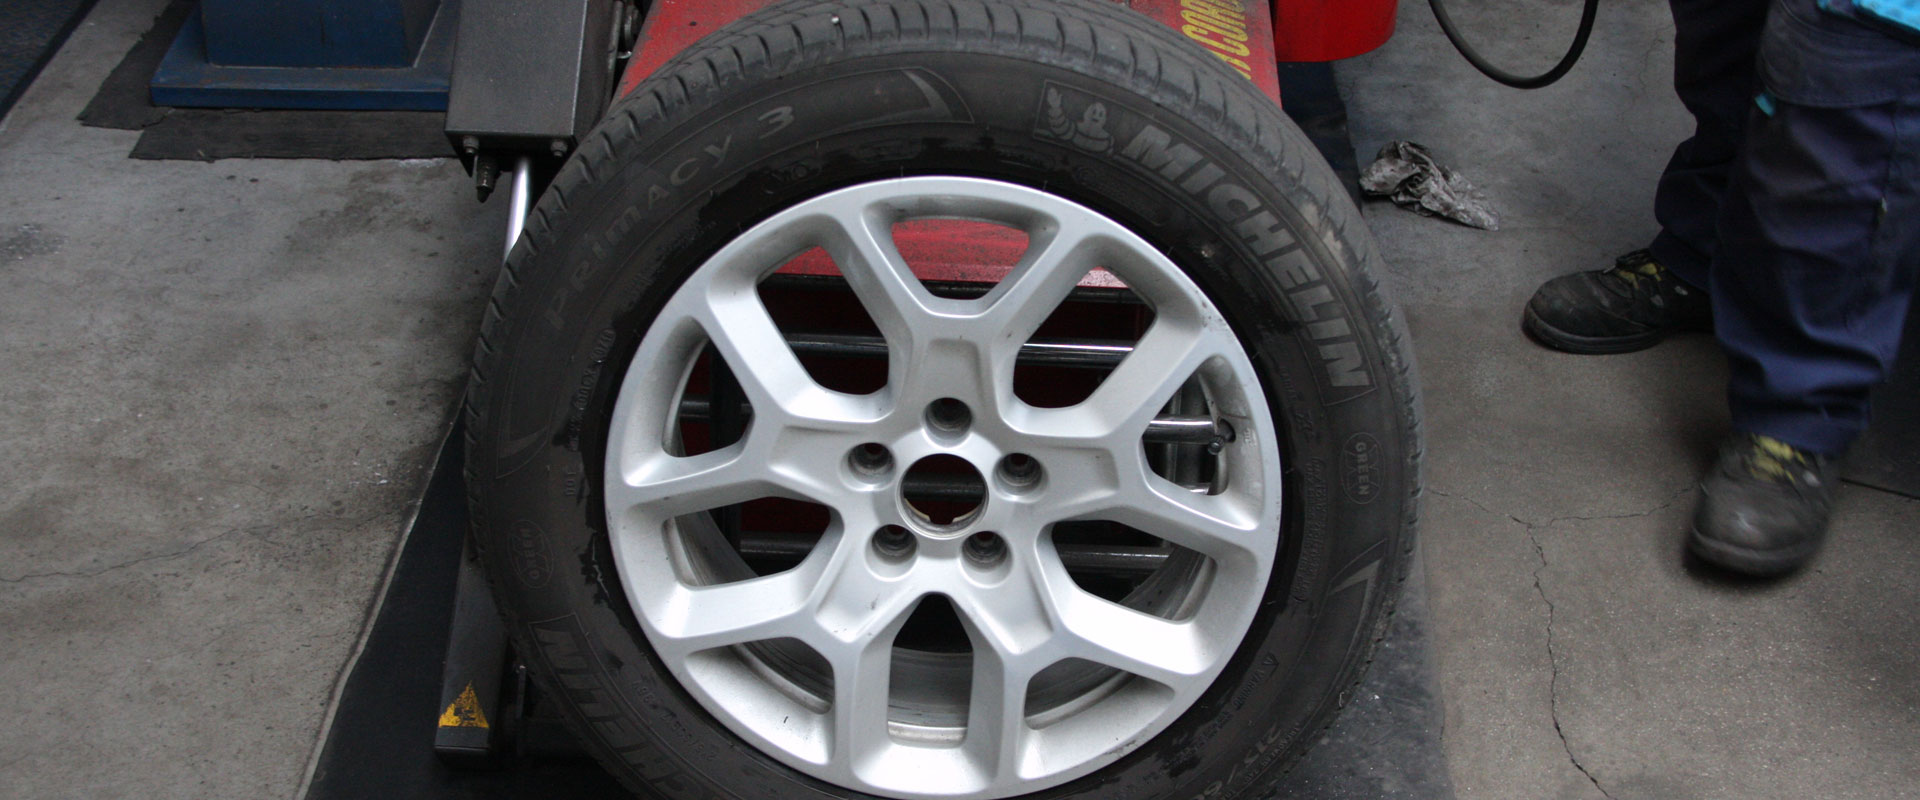 equilibratura pneumatici mantova